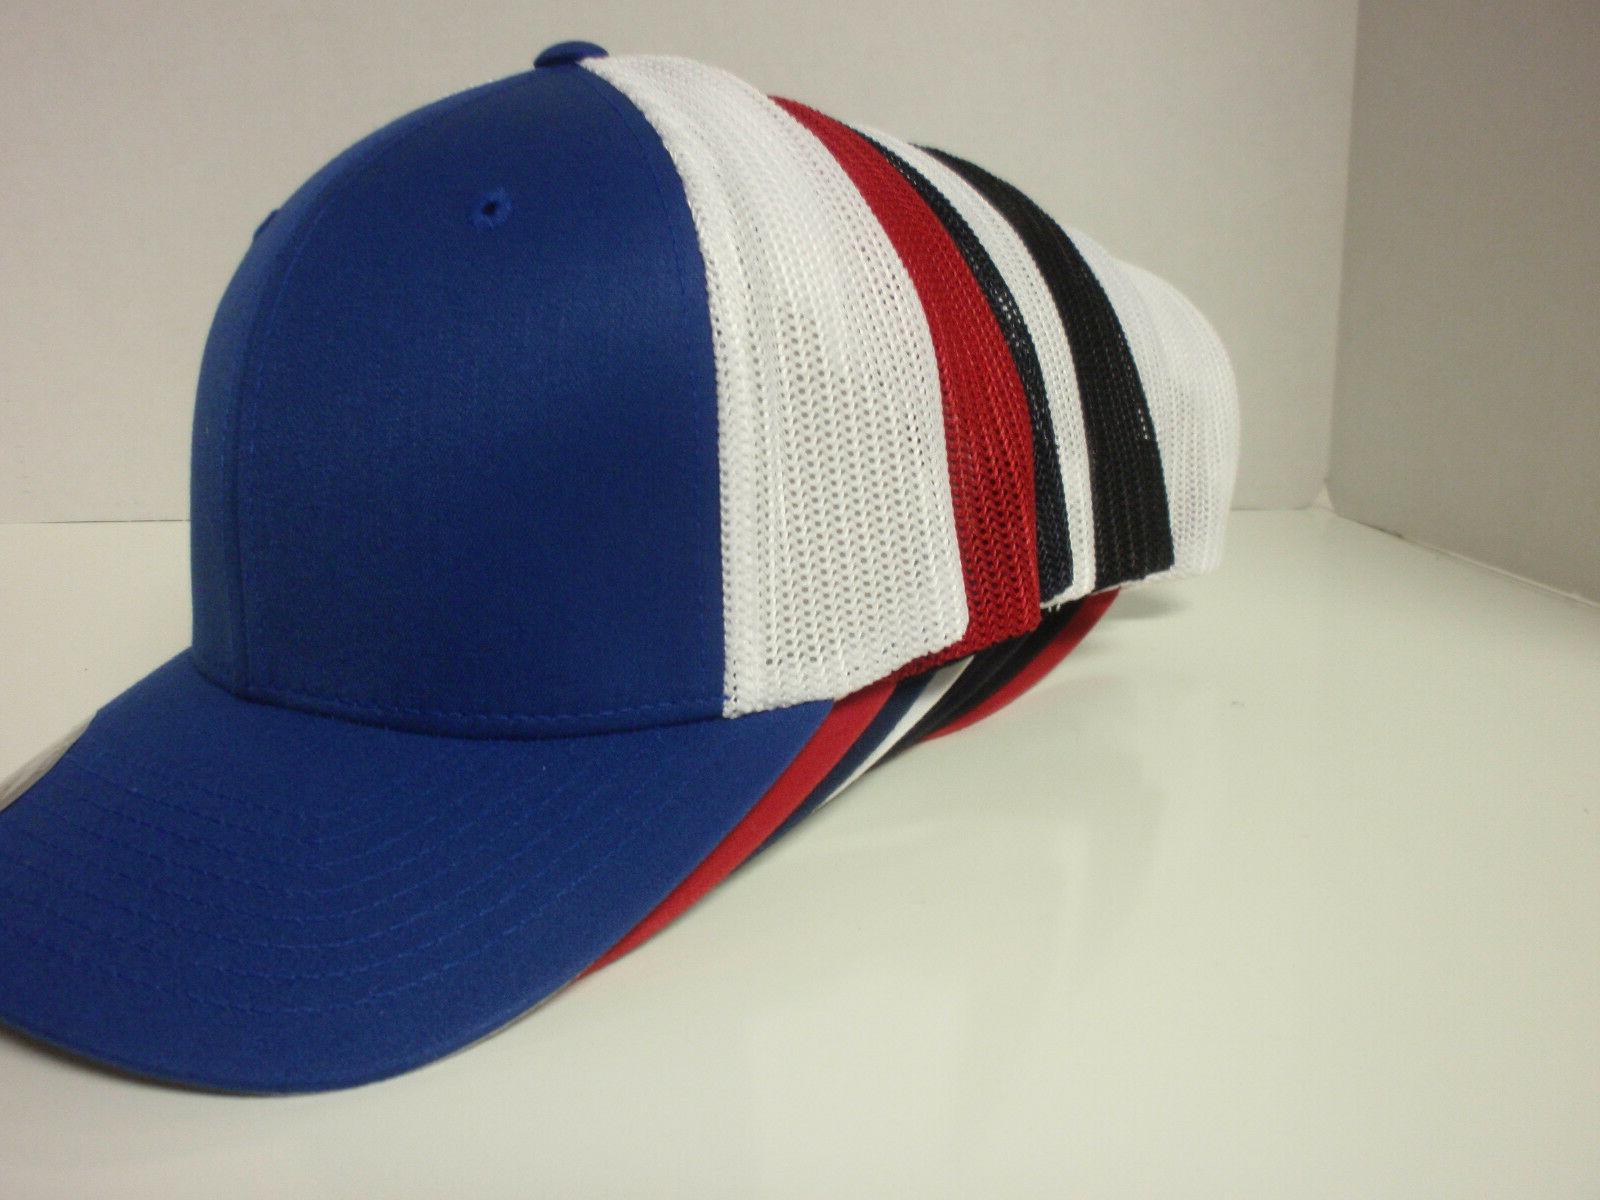 TRUCKER MESH CAP PLAIN BASEBALL FLEX CURVED 6511